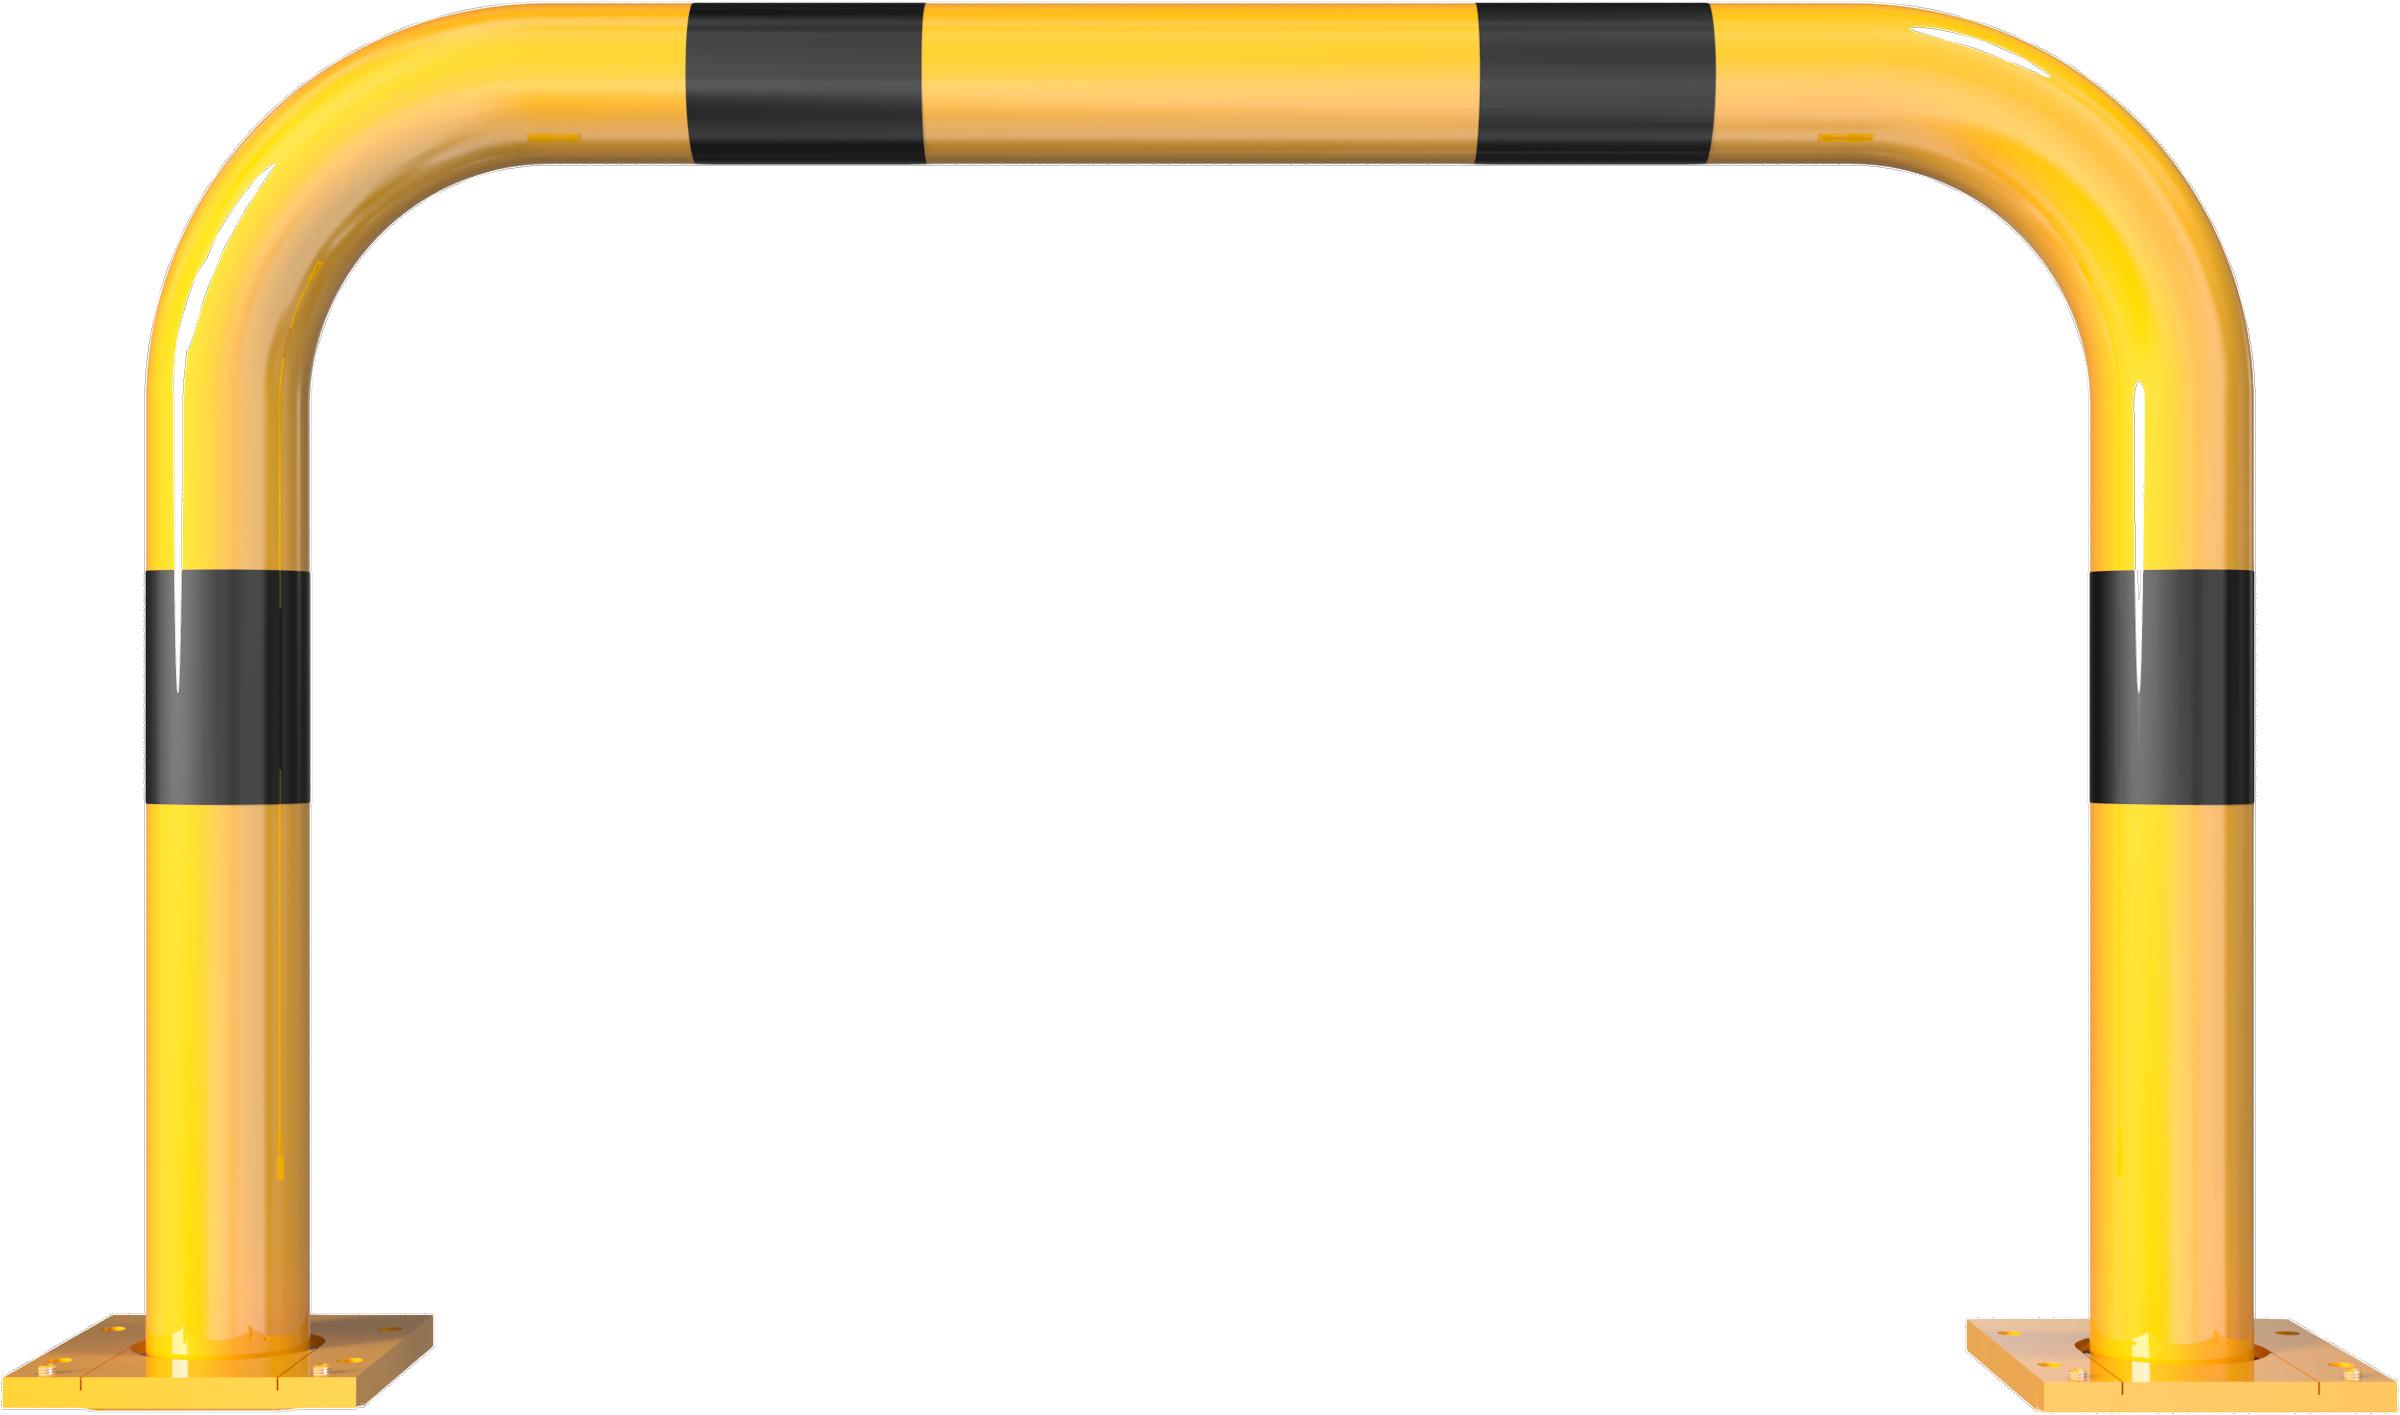 Schake Rammschutzbügel Stahl abnehmbar Ø 76 mm gelb | schwarz